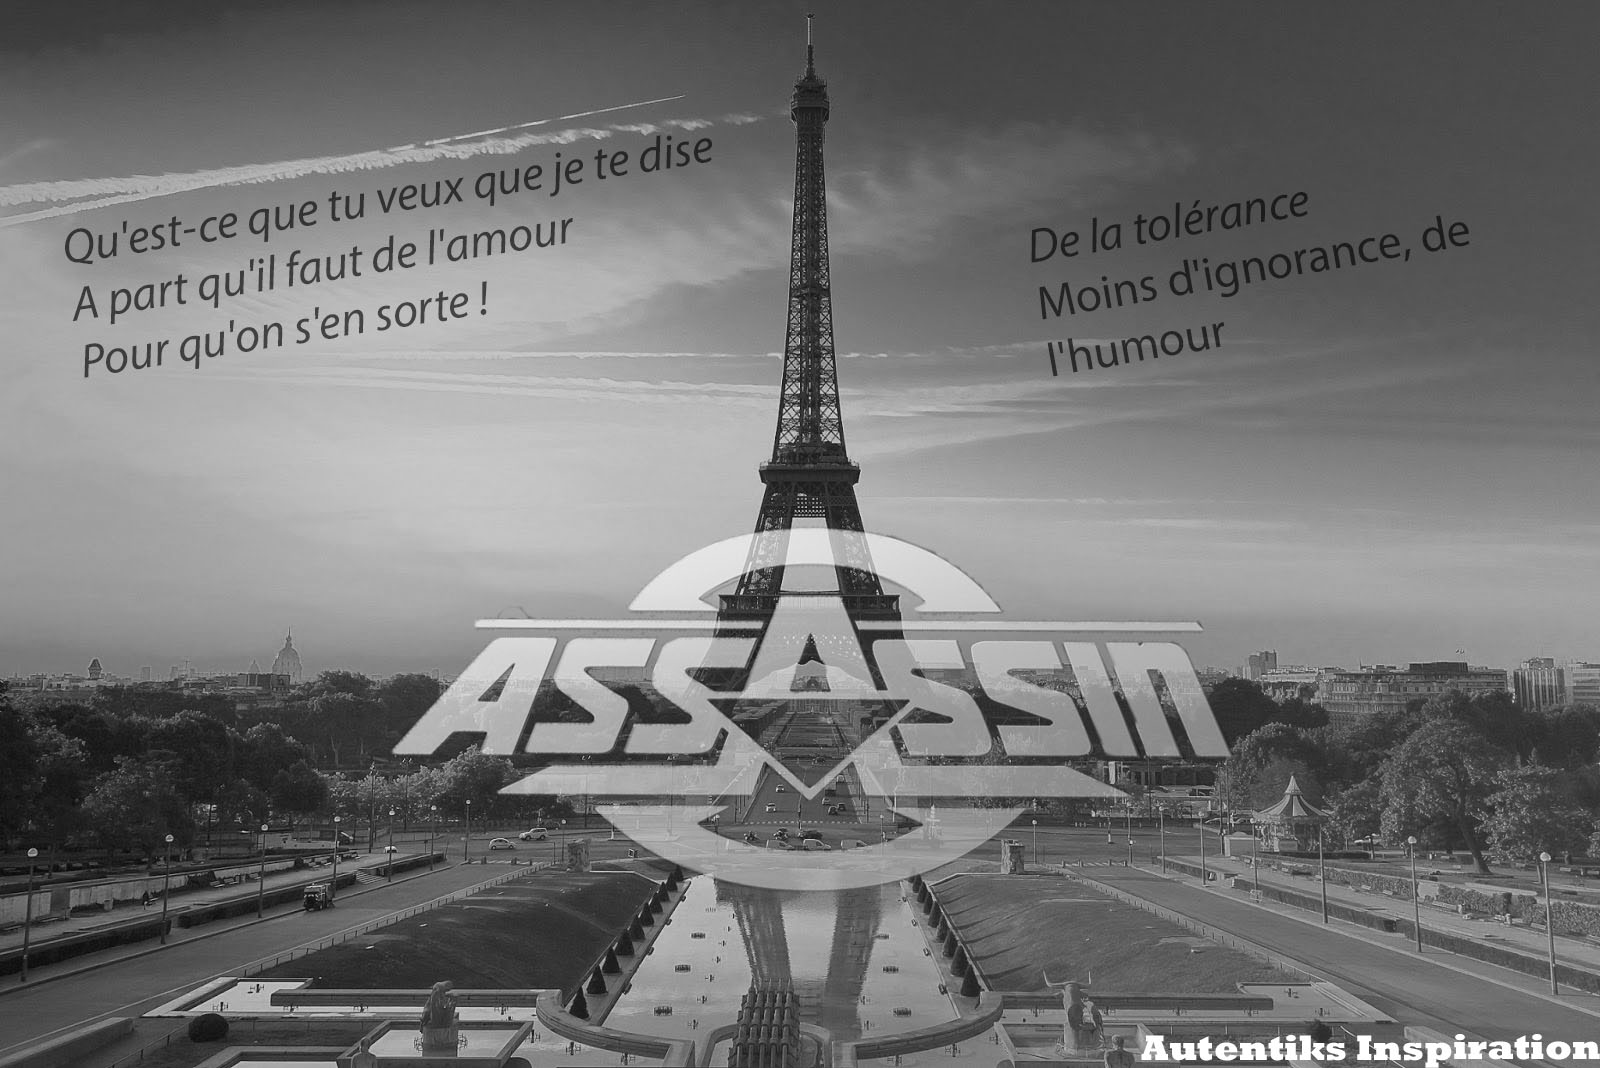 Autentiks_inspiration_assassin